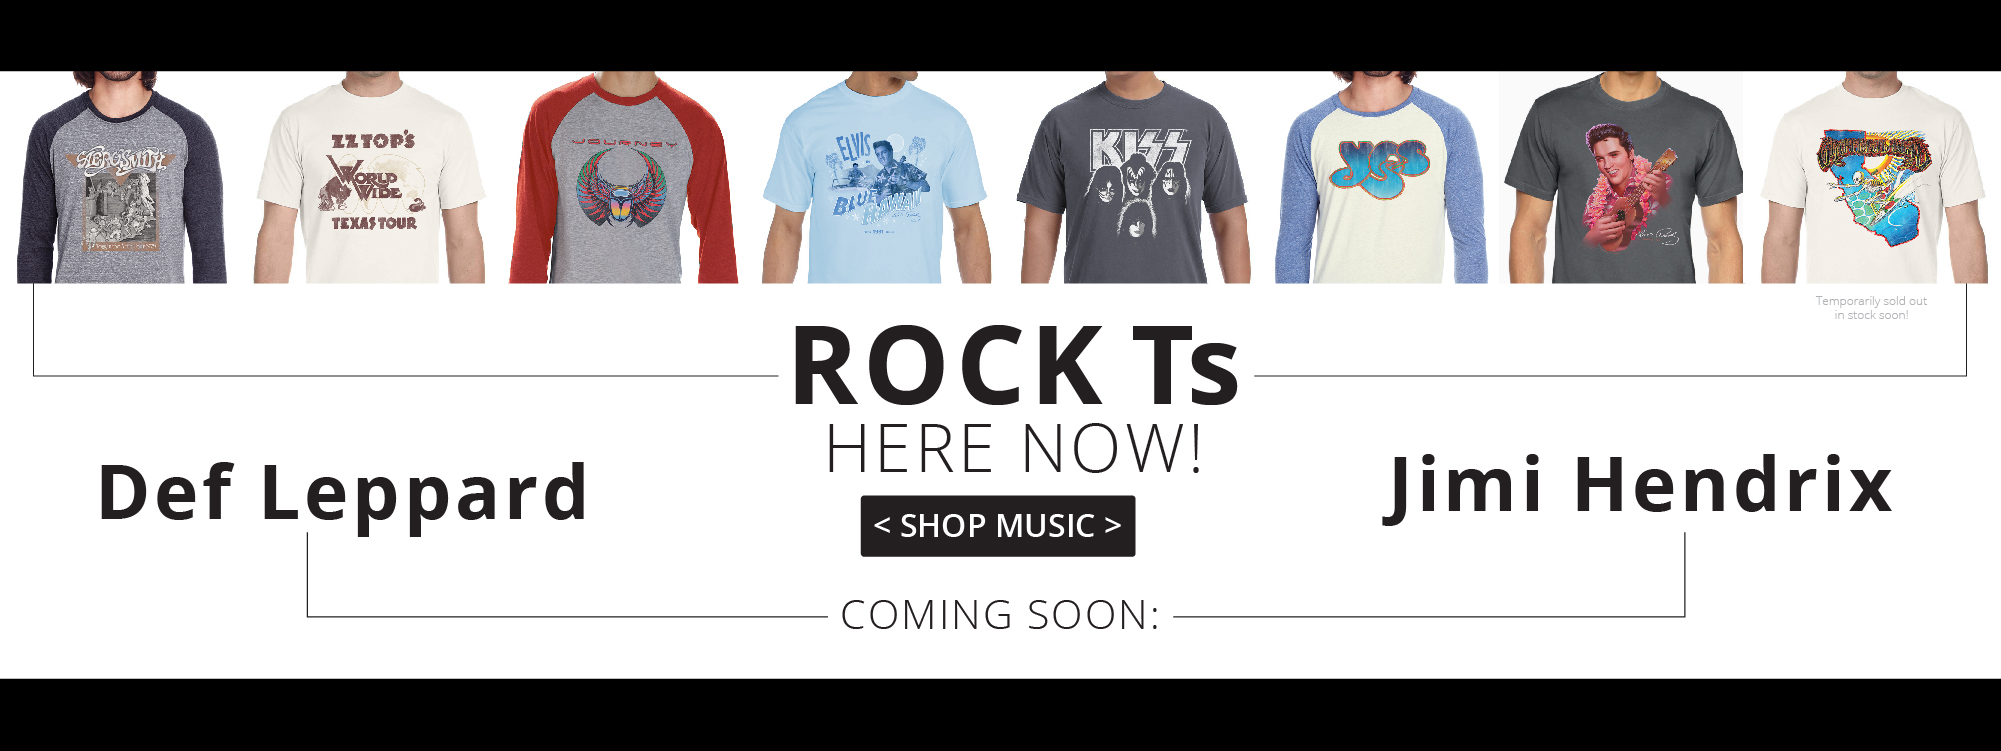 rock n roll t-shirts, vintage rock tshirts